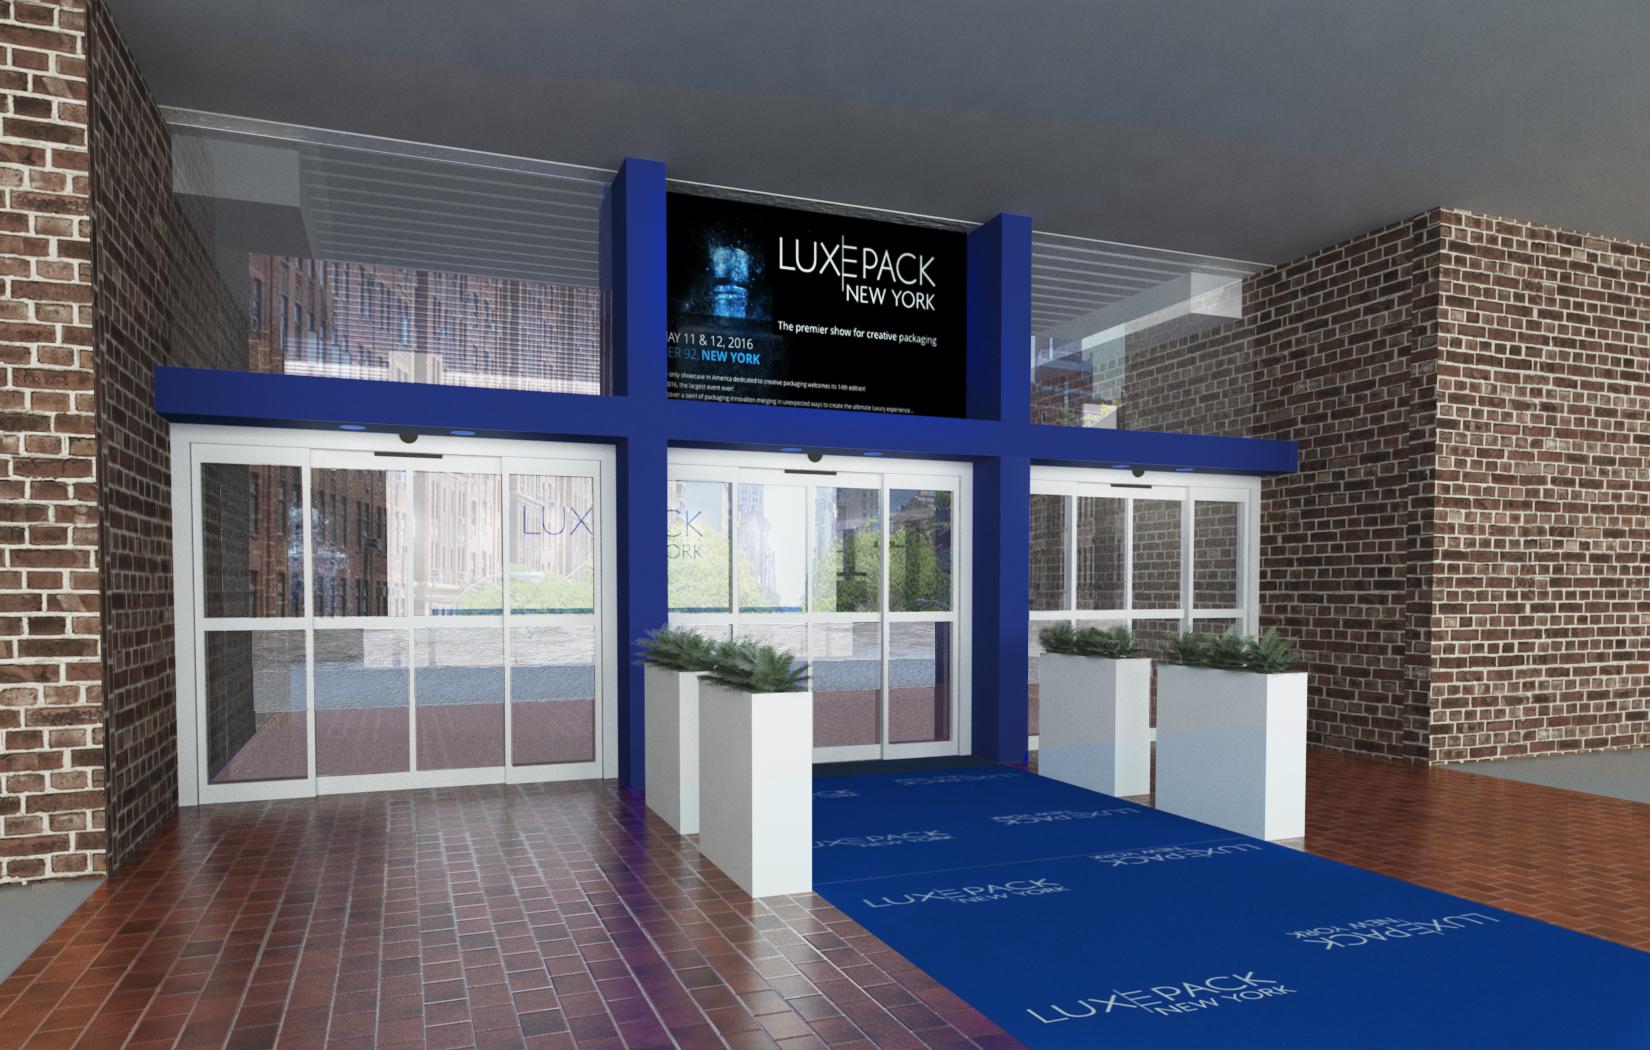 LUXEPACK 2016 - ENTRACE AREA